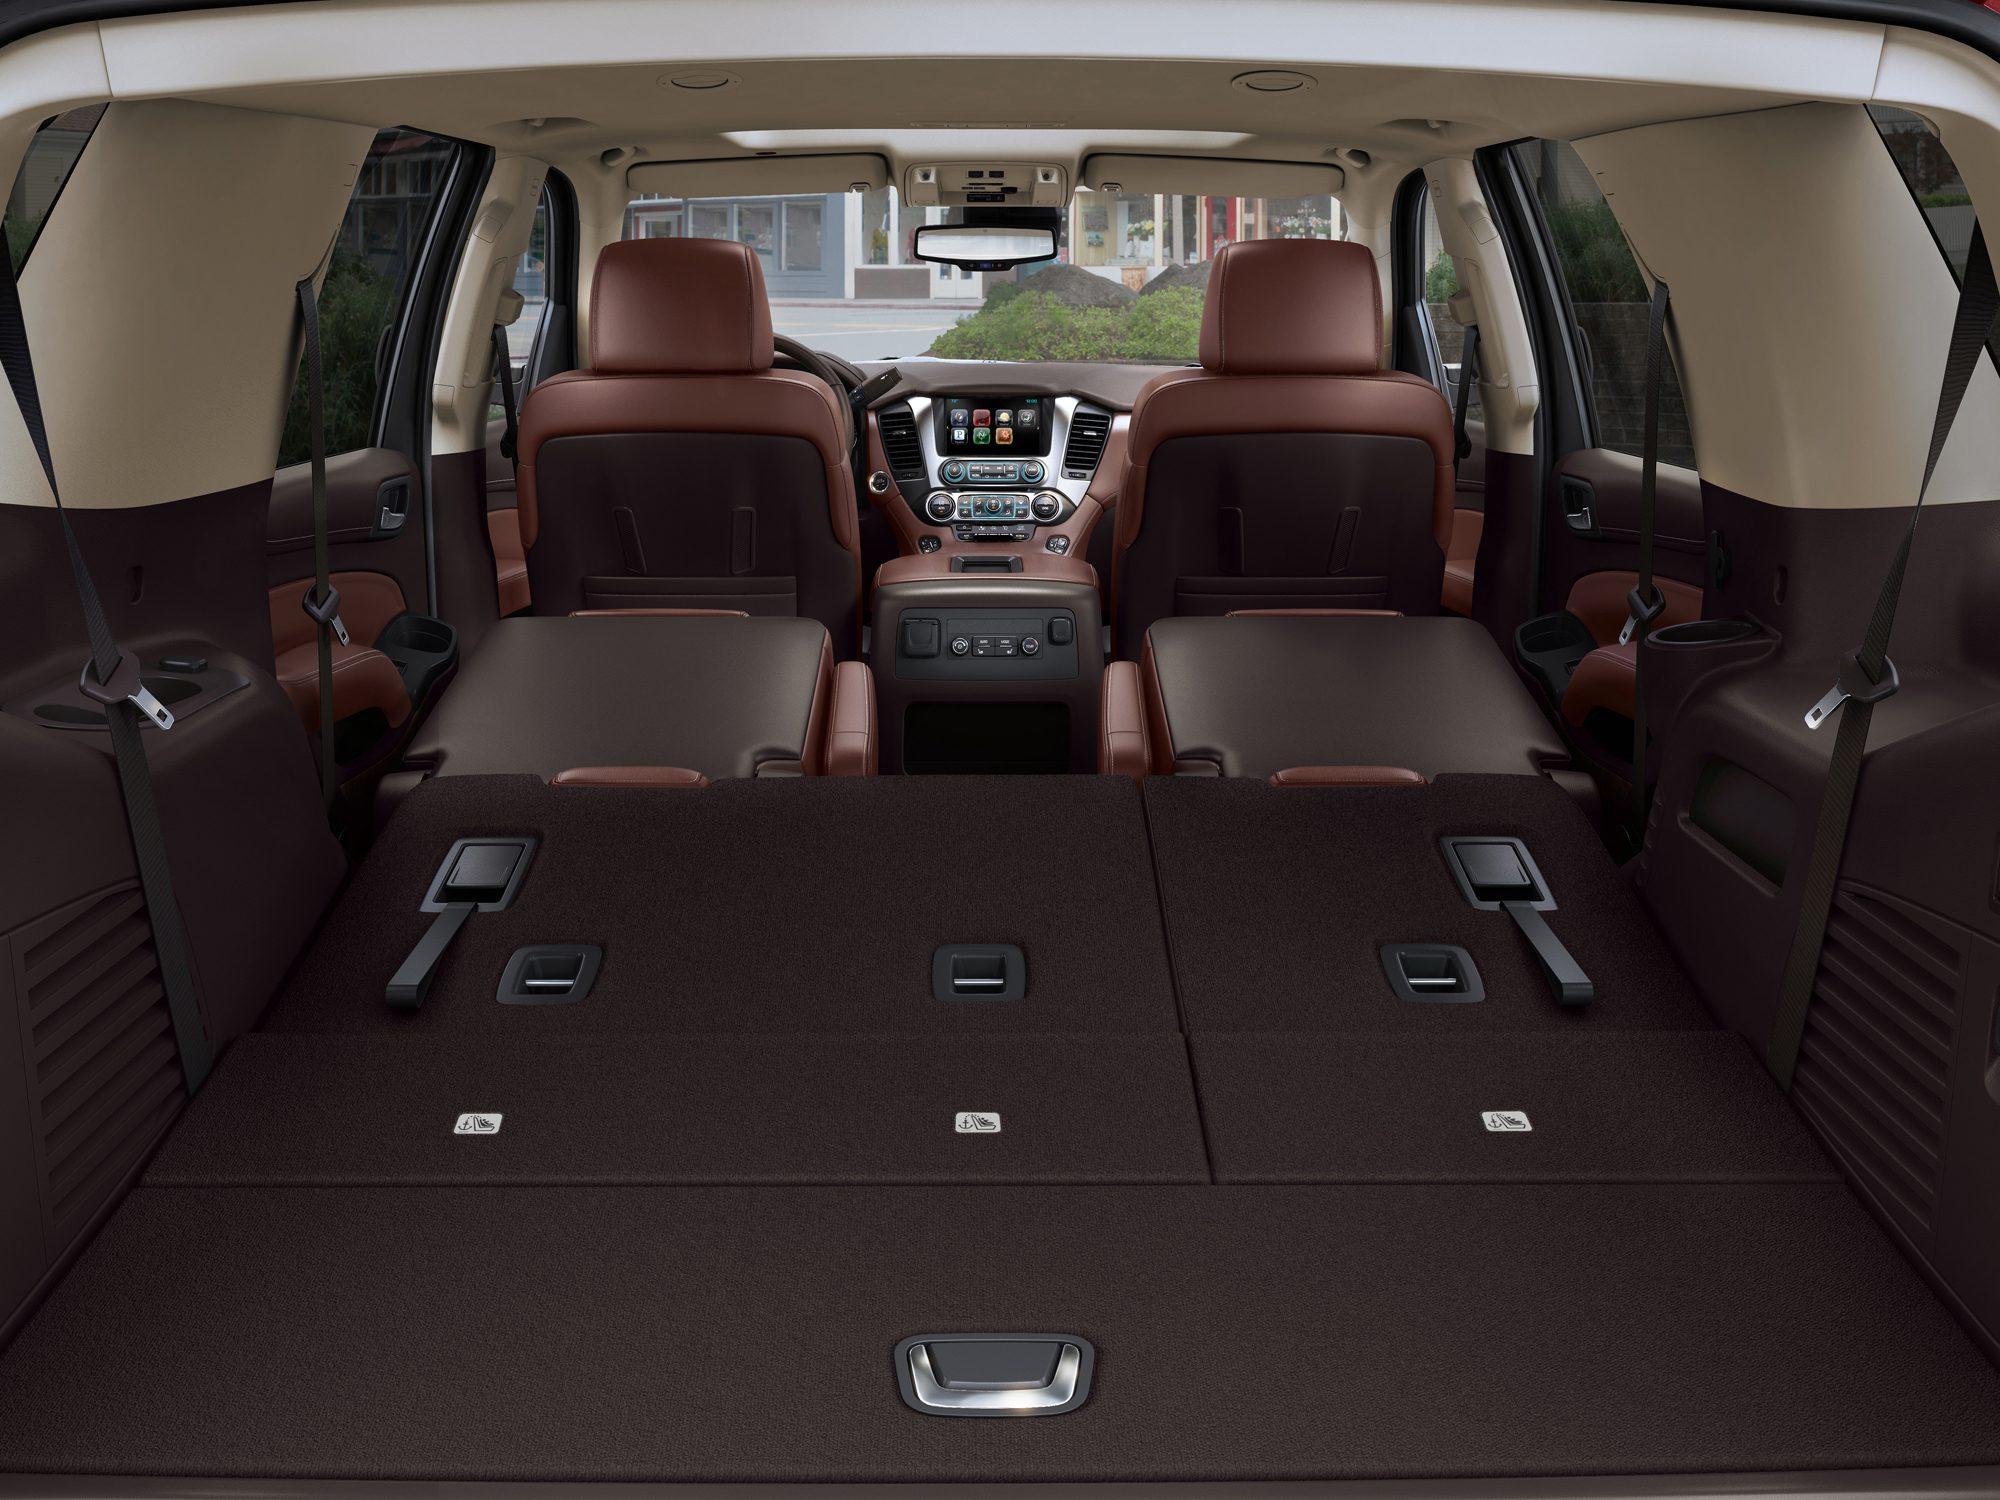 5. An easily customizable cabin.